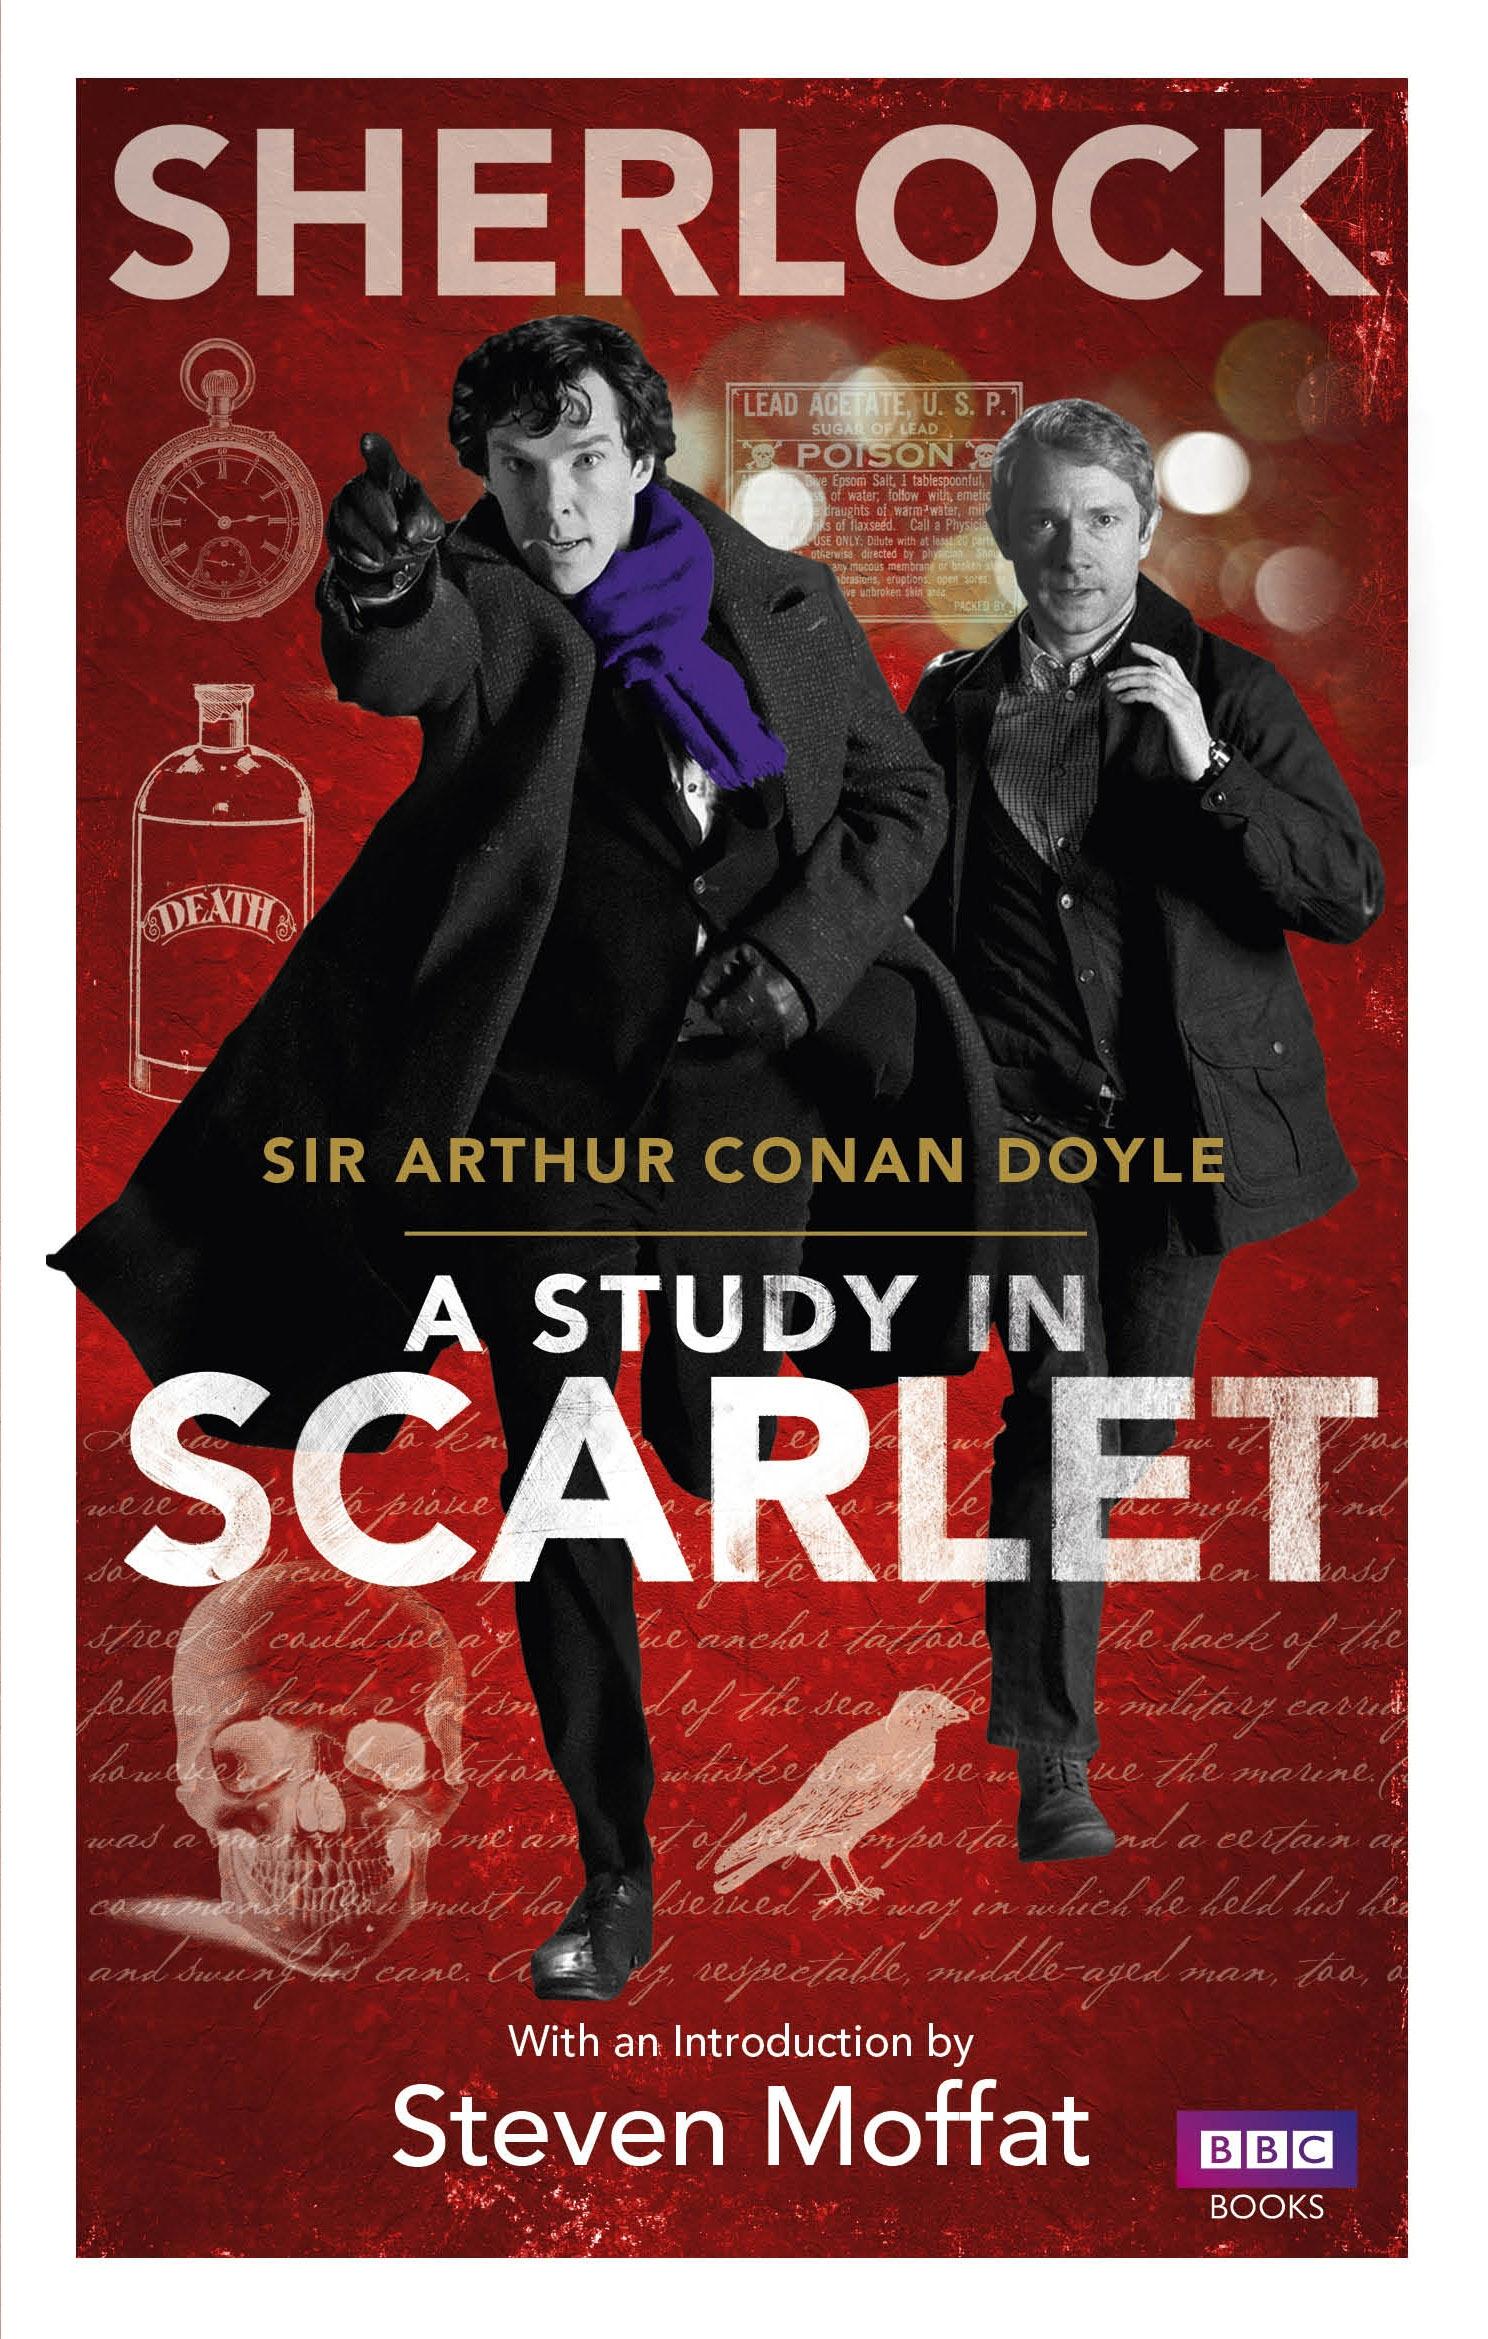 'A Study in Scarlet' Theme Analysis – Pistosaurius